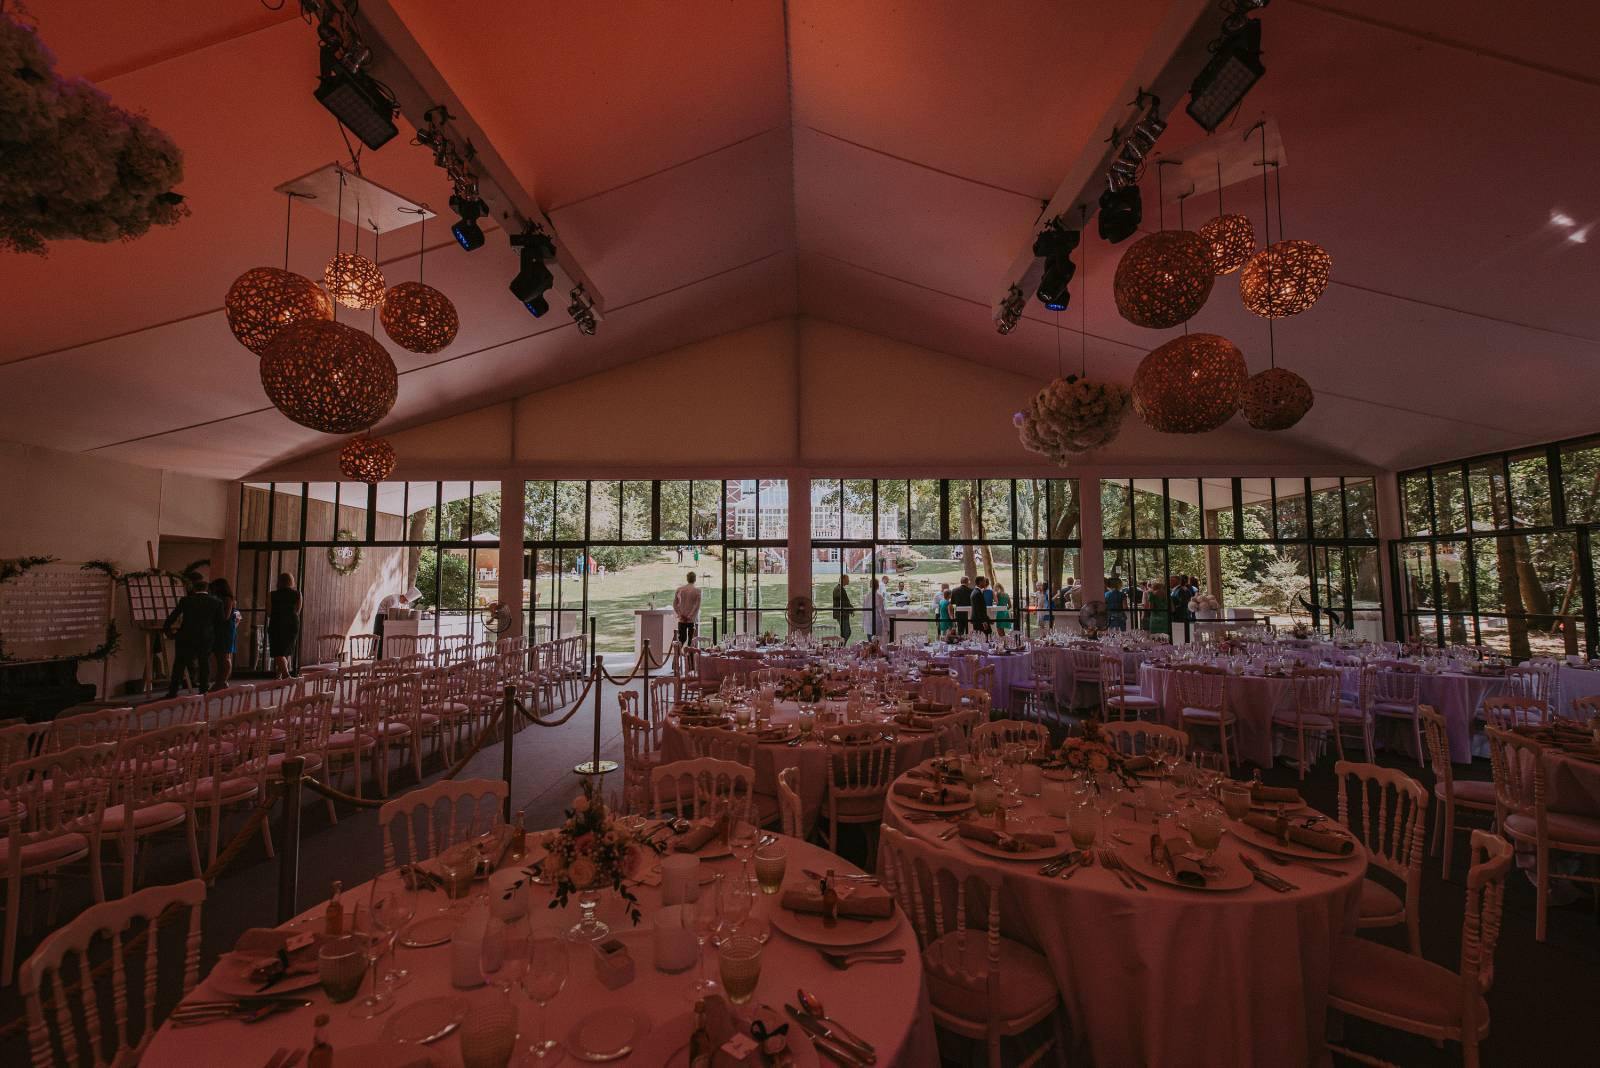 Excellence Weddings - House of Weddings - Aurélien ScArt (18)